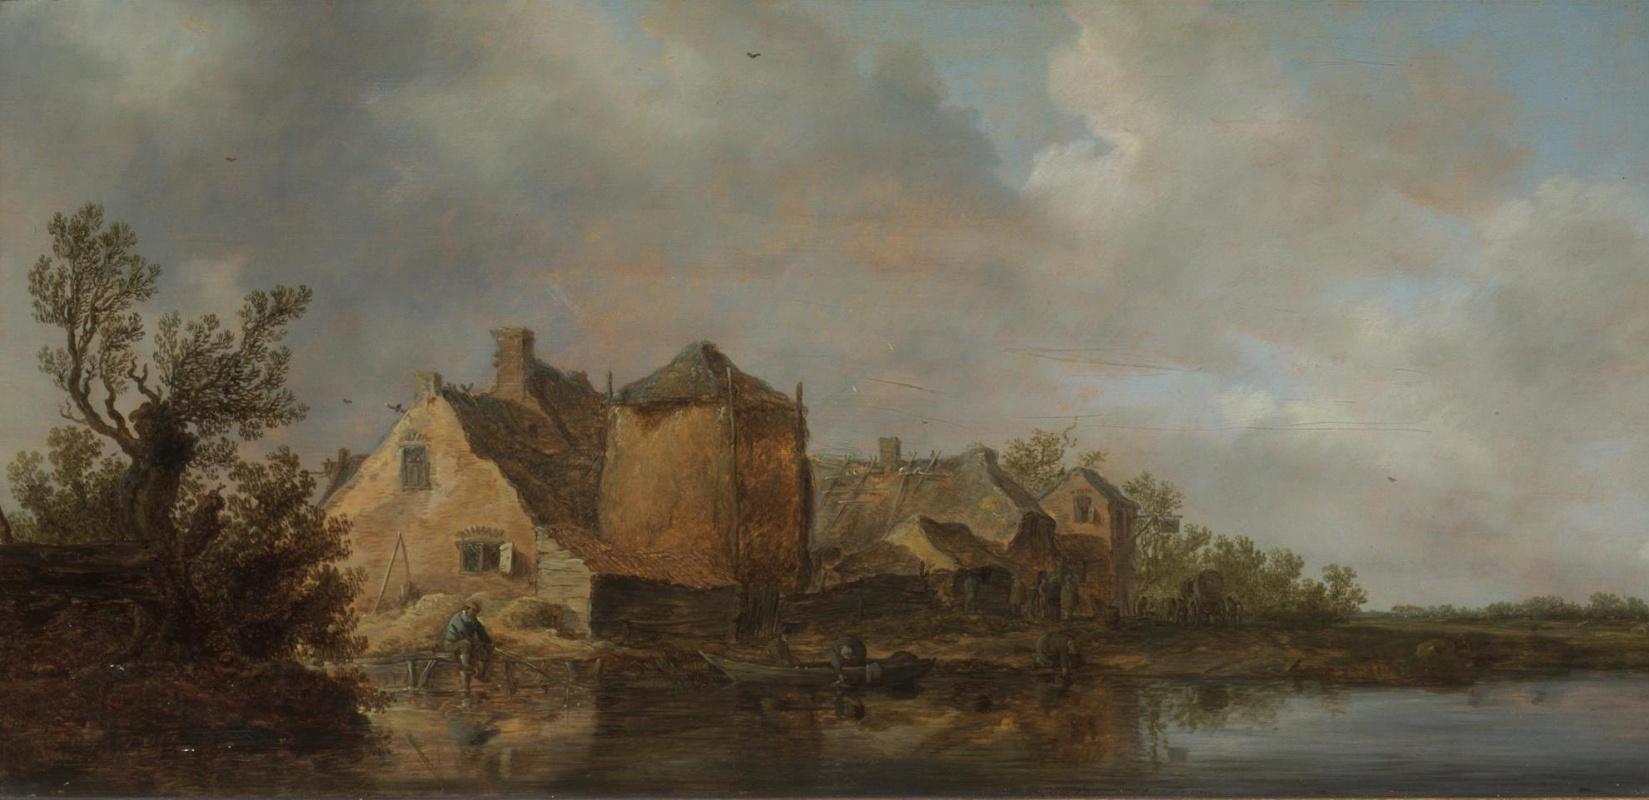 Jan van Goyen. The hotel is on a river